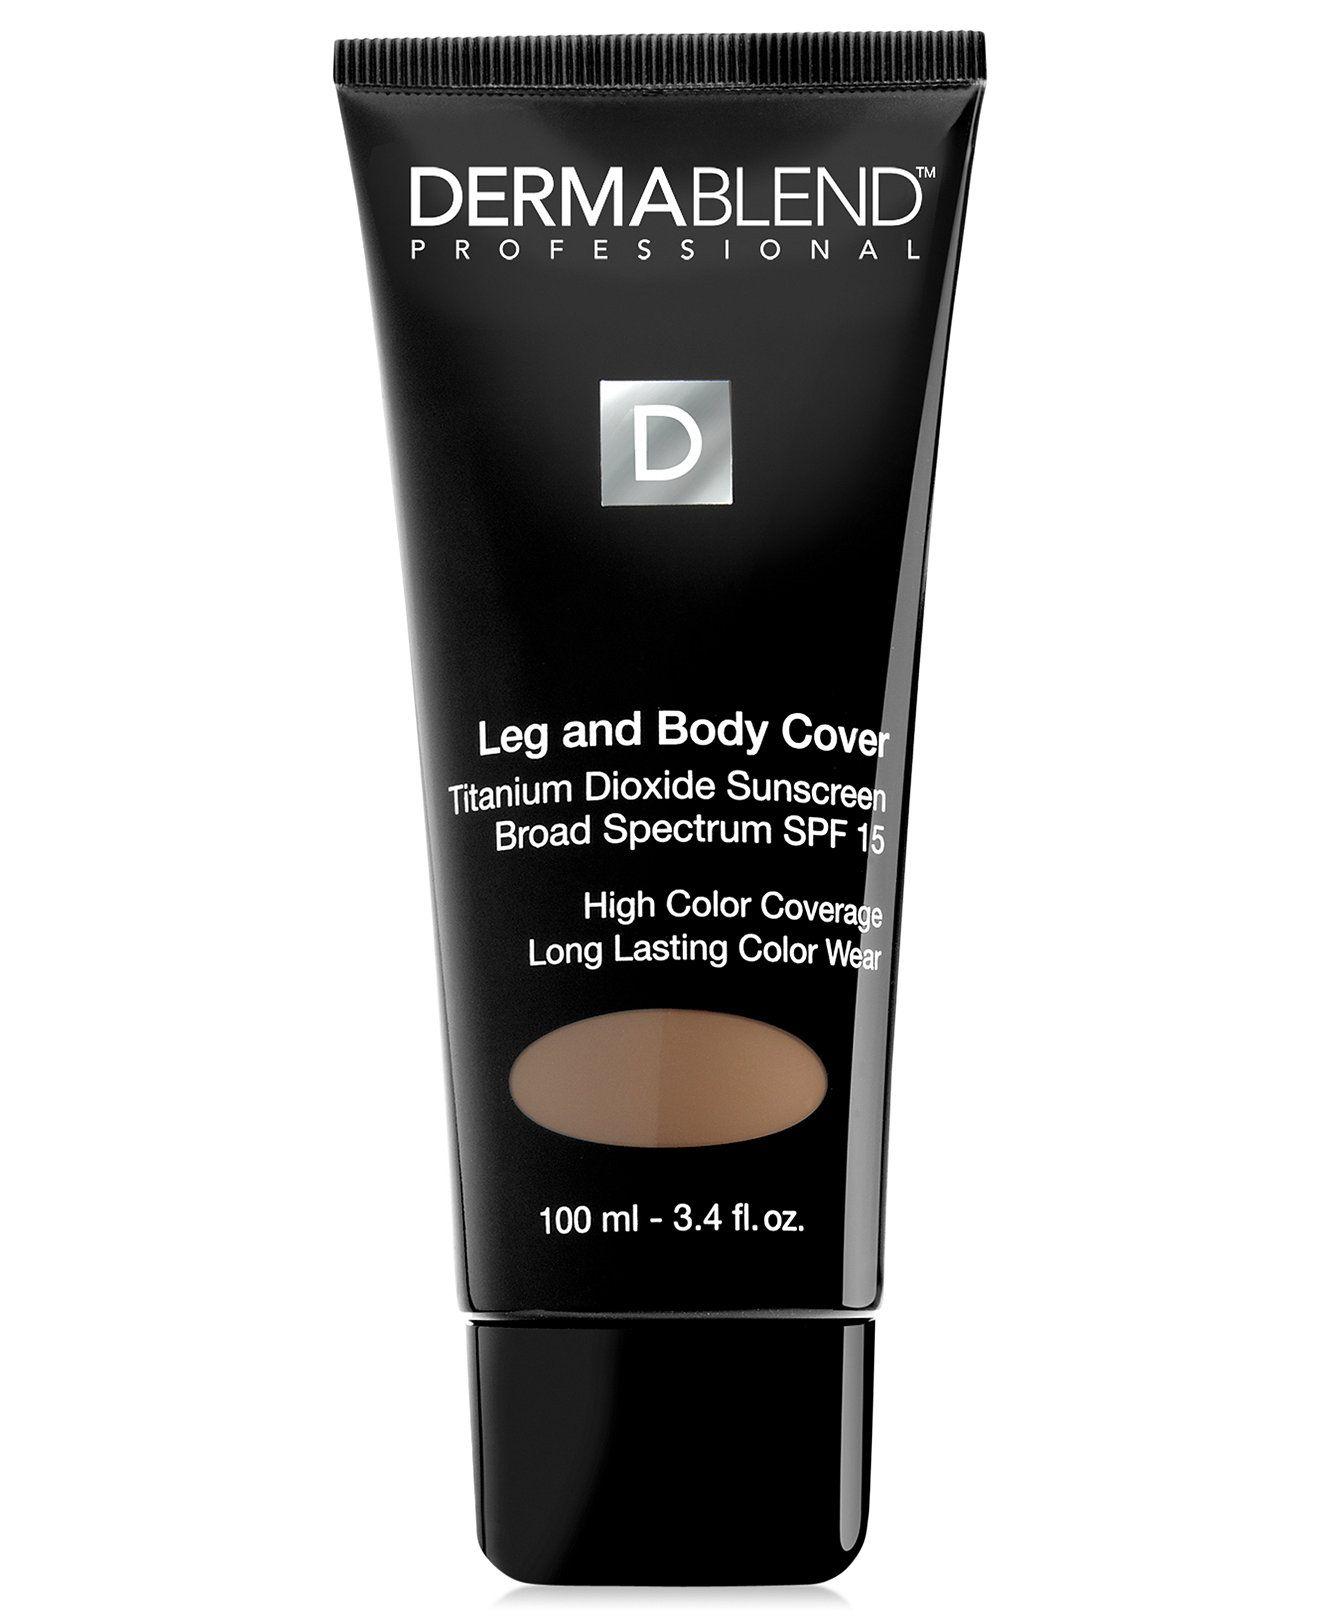 Dermablend Leg & Body Cover, 3.4 oz Dermablend, Spf 15